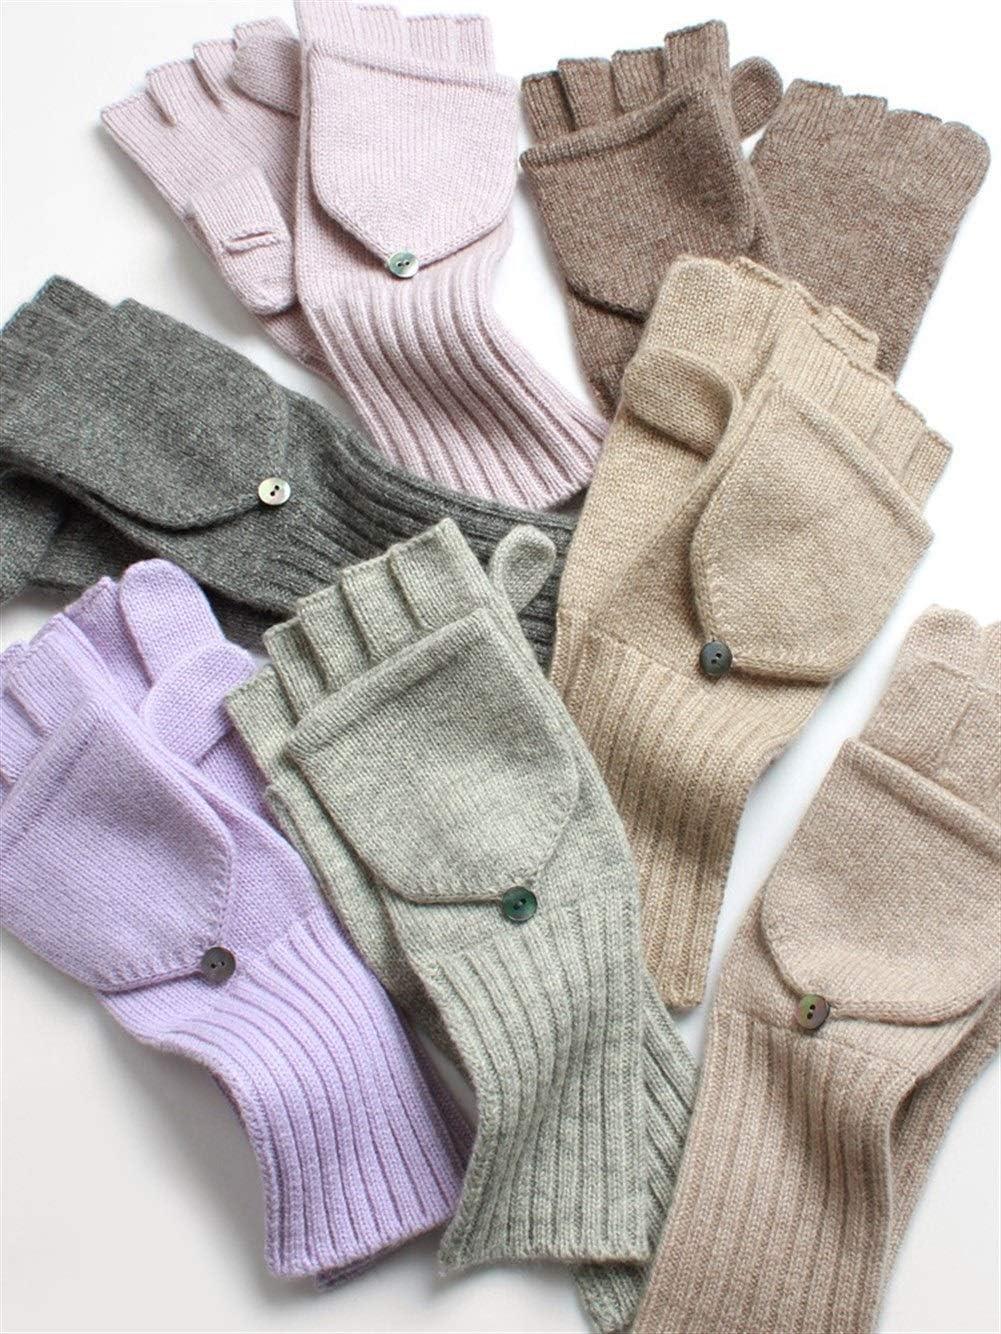 Winter Gloves Warm Gloves Warm Flip Ladies Soft Long Cashmere Gloves (Color : Navy, Size : One Size)